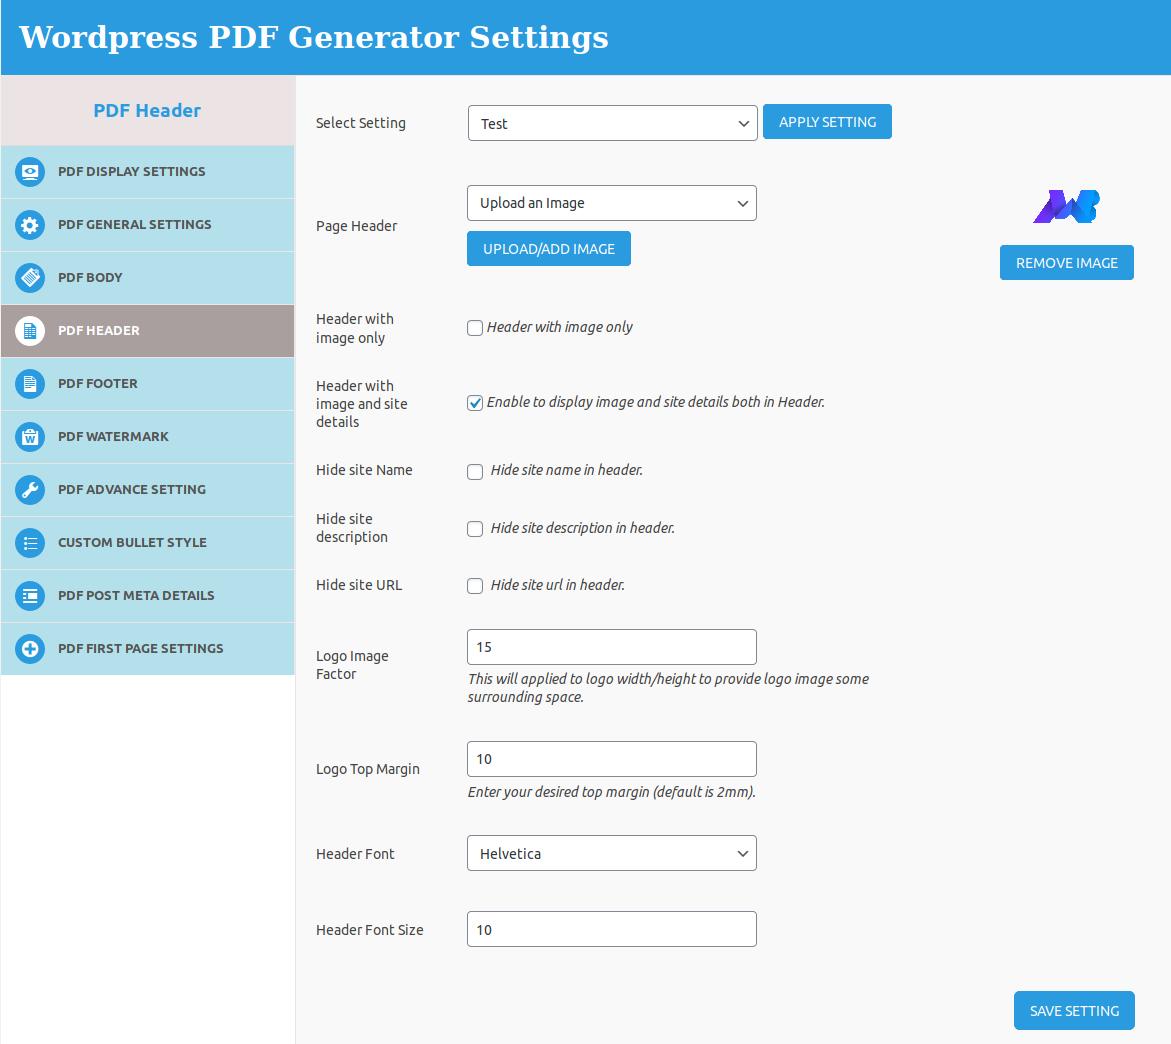 pdf-header-setting